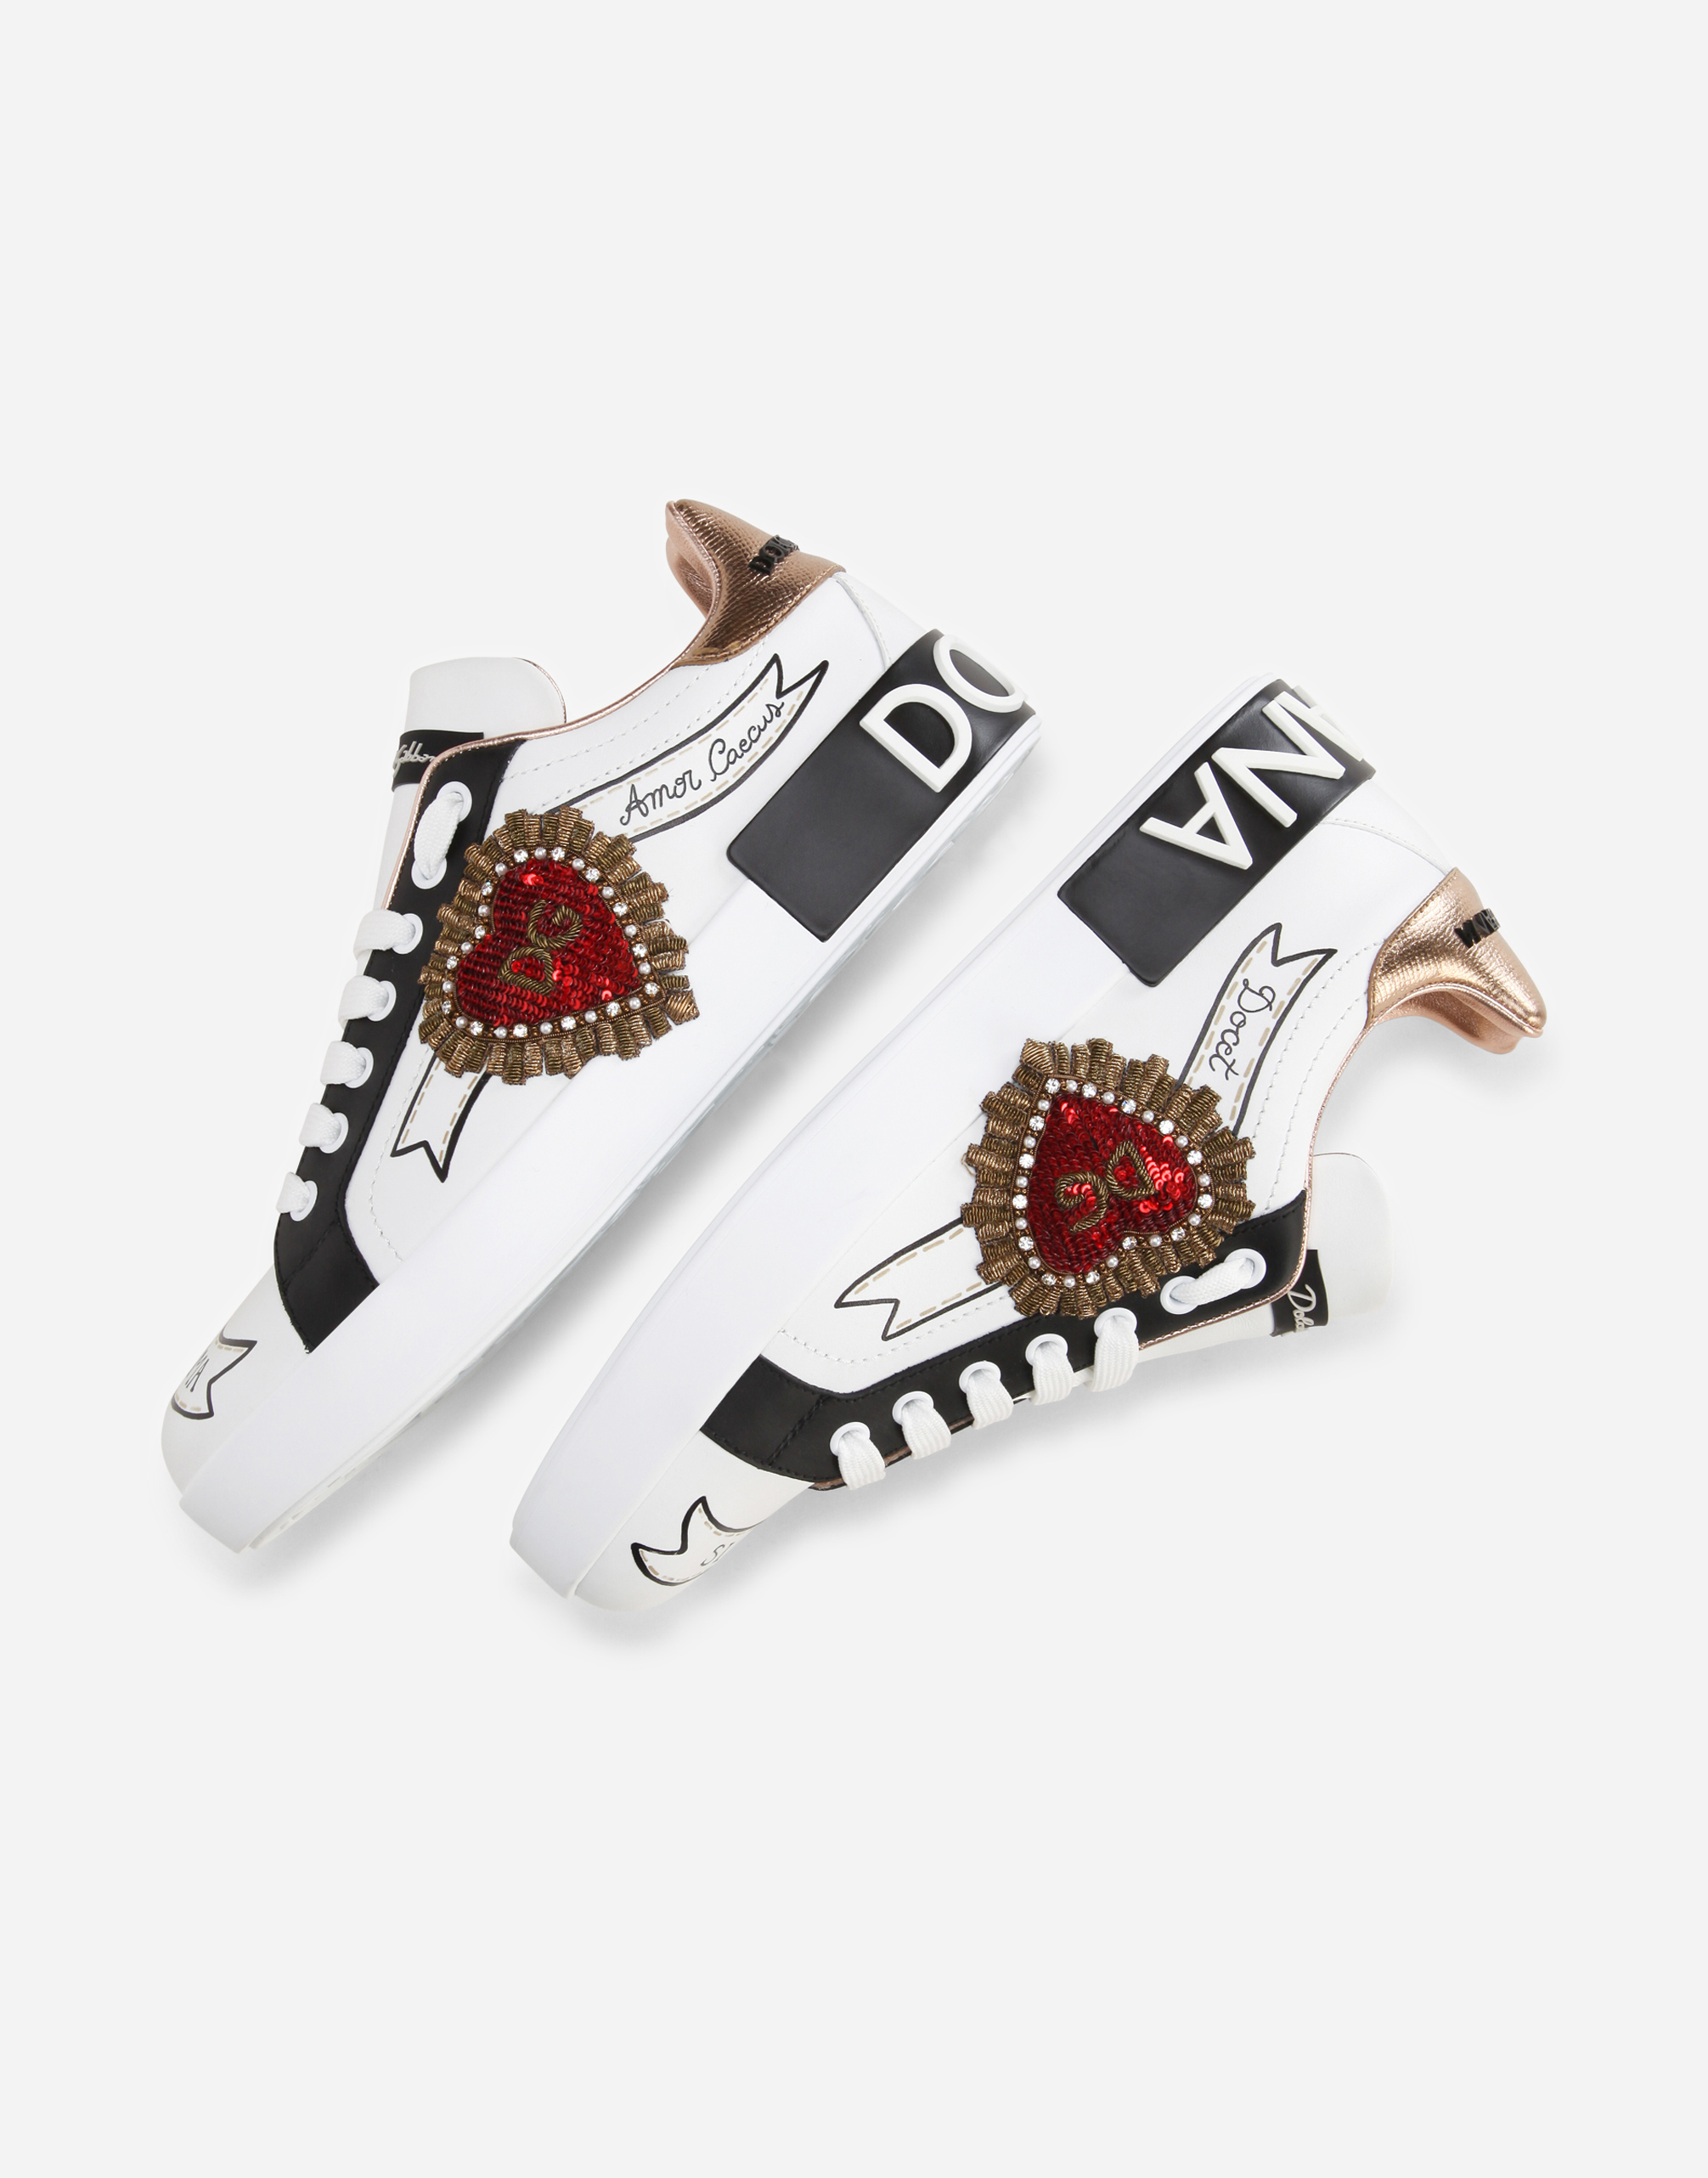 Dolce & Gabbana PORTOFINO SNEAKERS IN NAPPA CALFSKIN WITH DESIGNERS' PATCHES